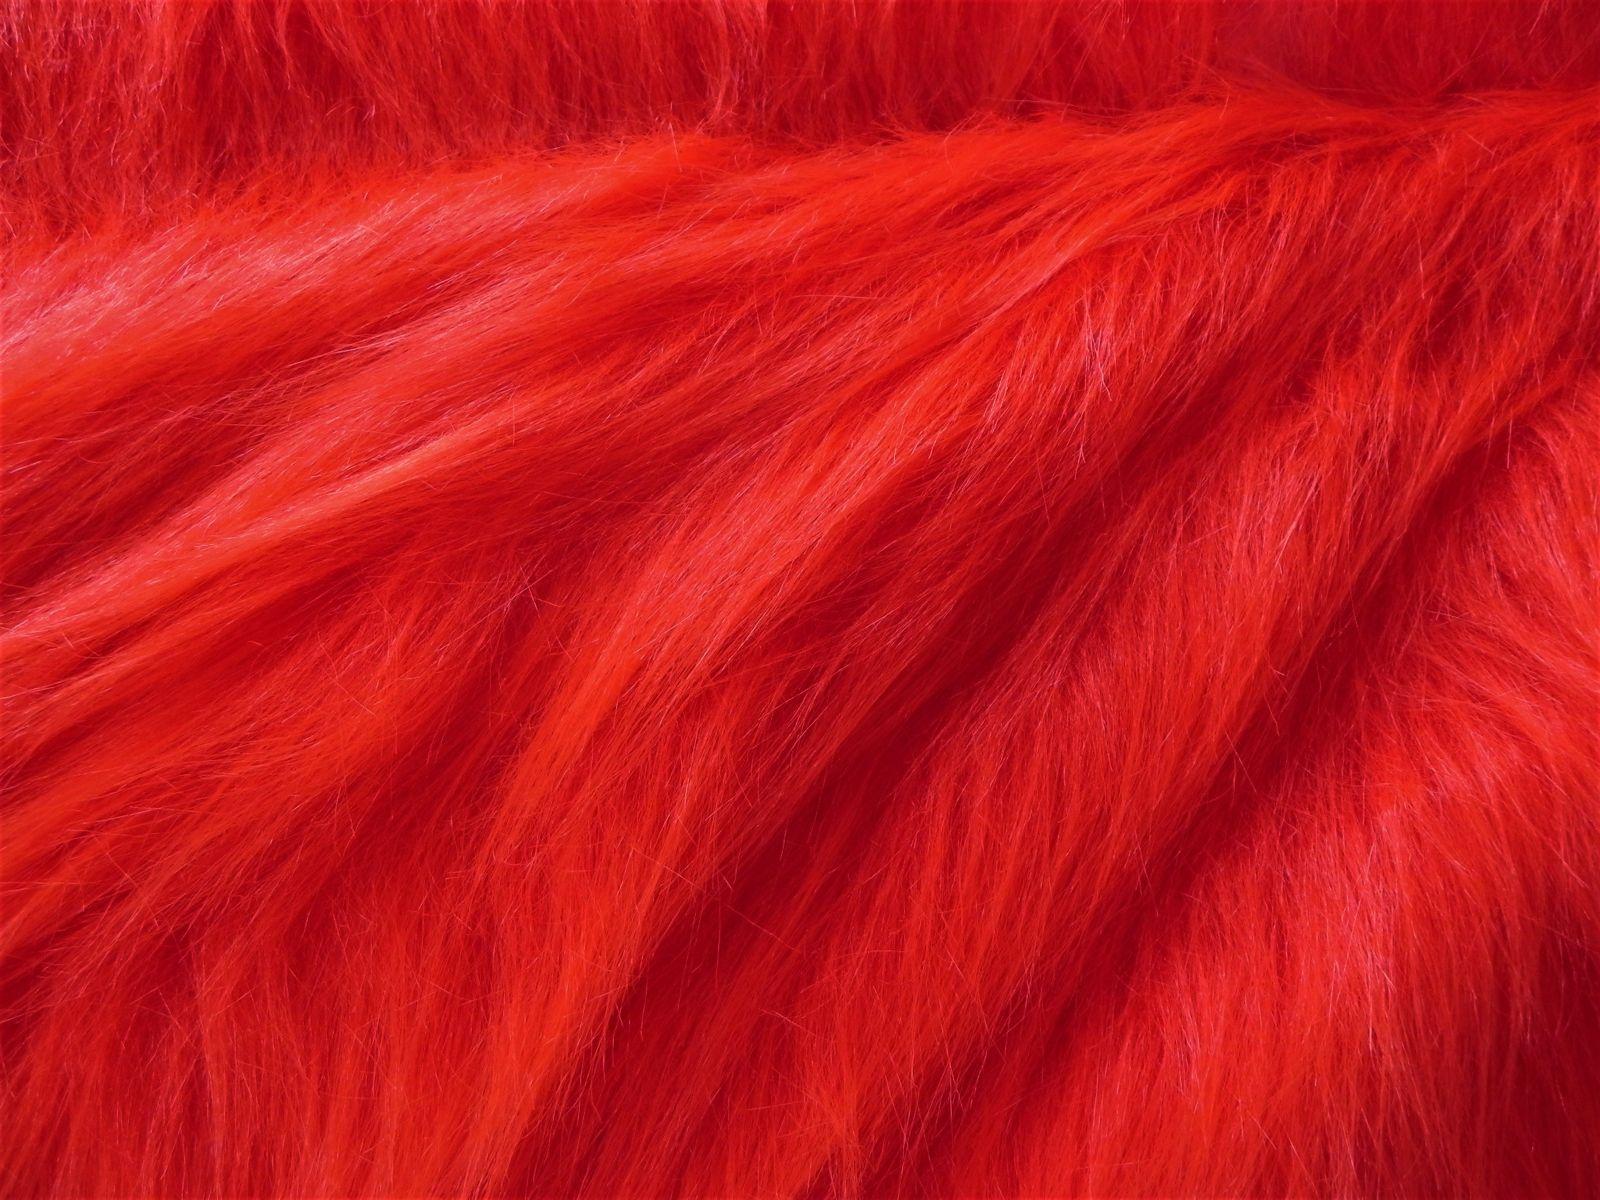 Umělá kožešina metráž, červená, 90mm vlas, š. 143cm